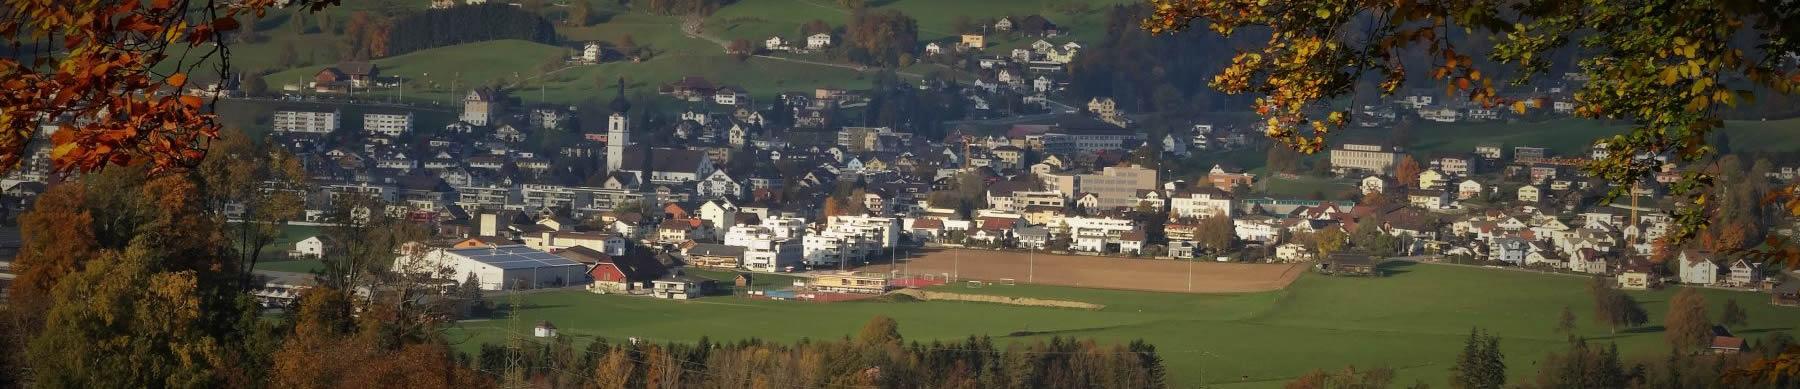 Wasserkorporation Kaltbrunn